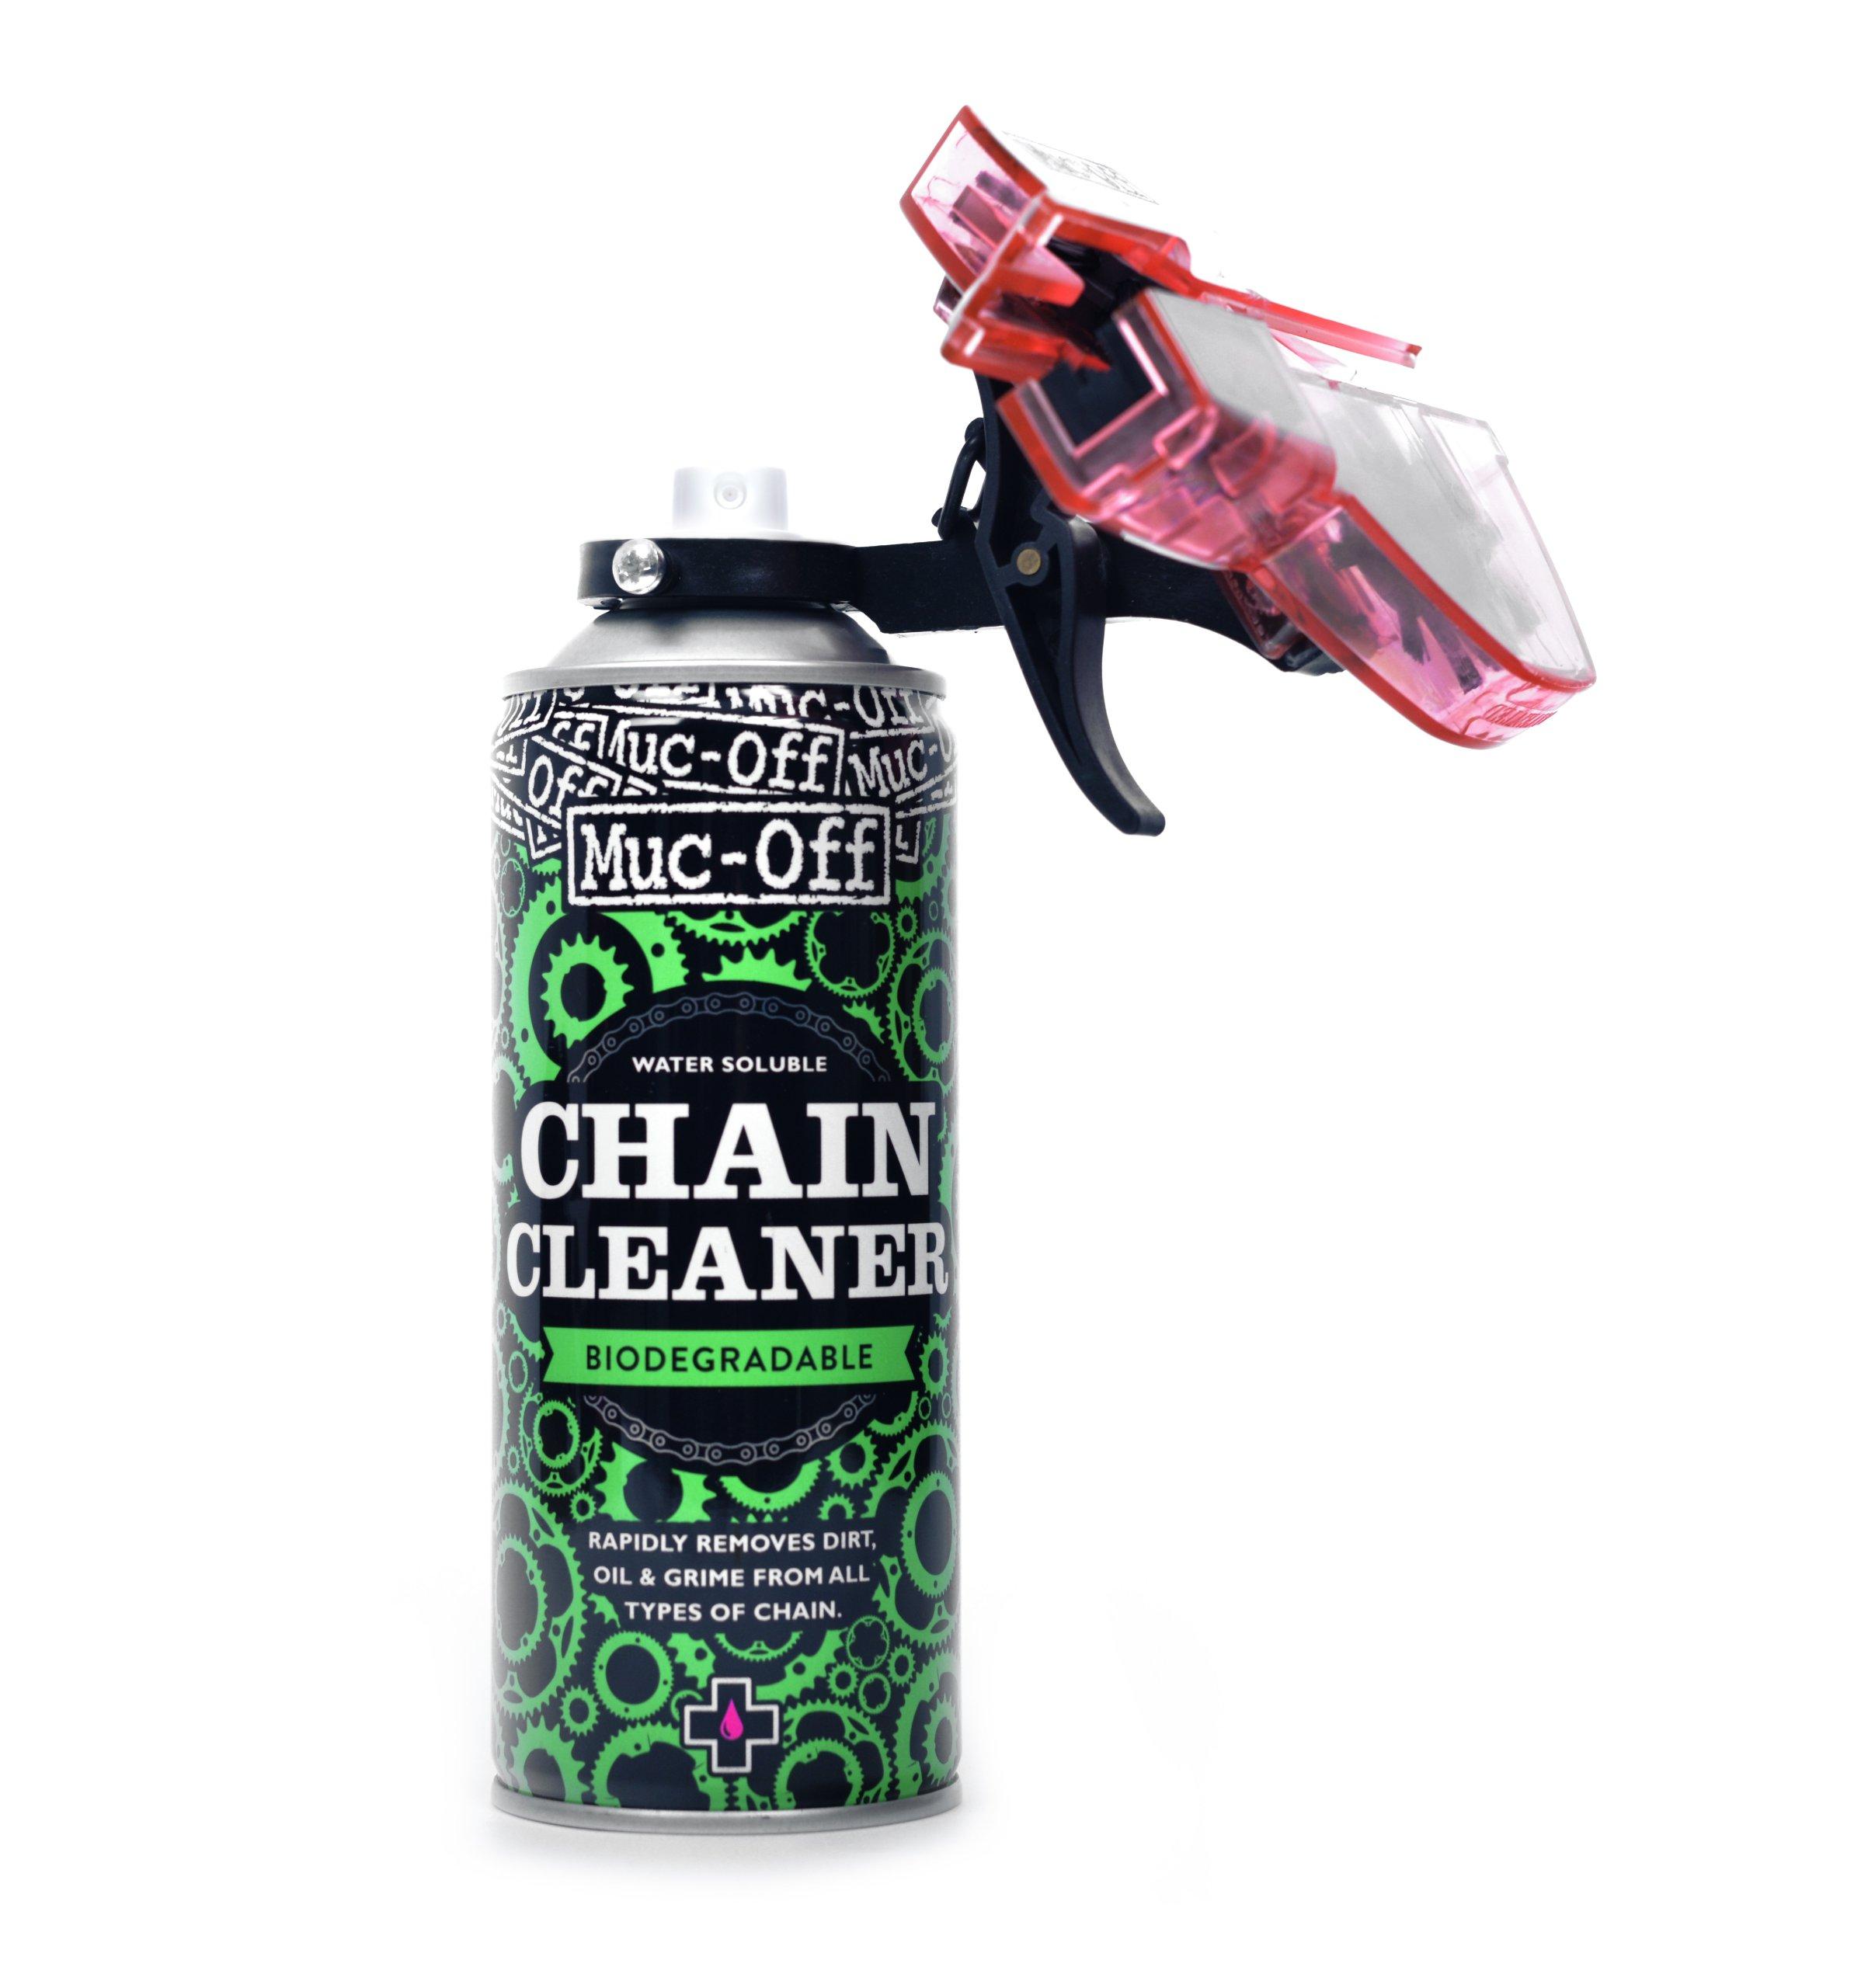 Muc-Off Bike degreaser Chain Doc incl. Chain Cleaner